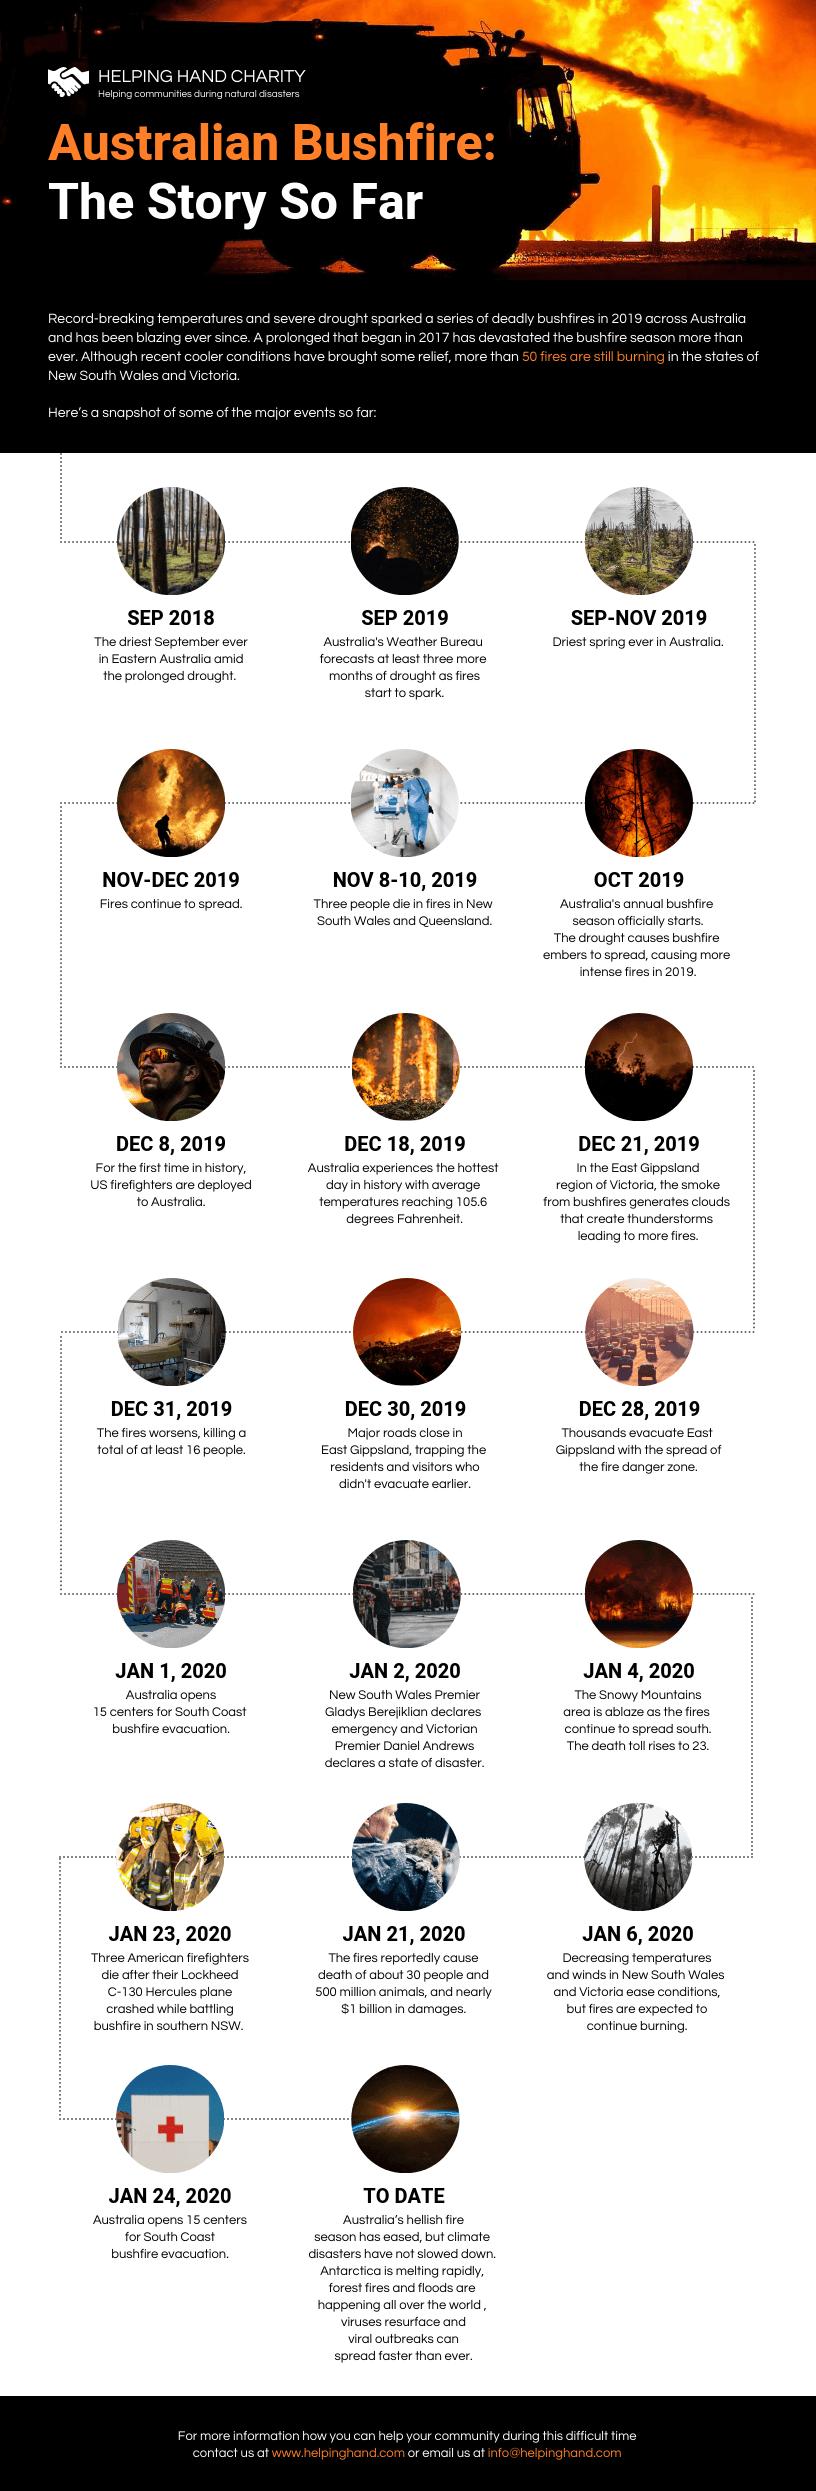 Australian Bushfires Timeline Infographic Template